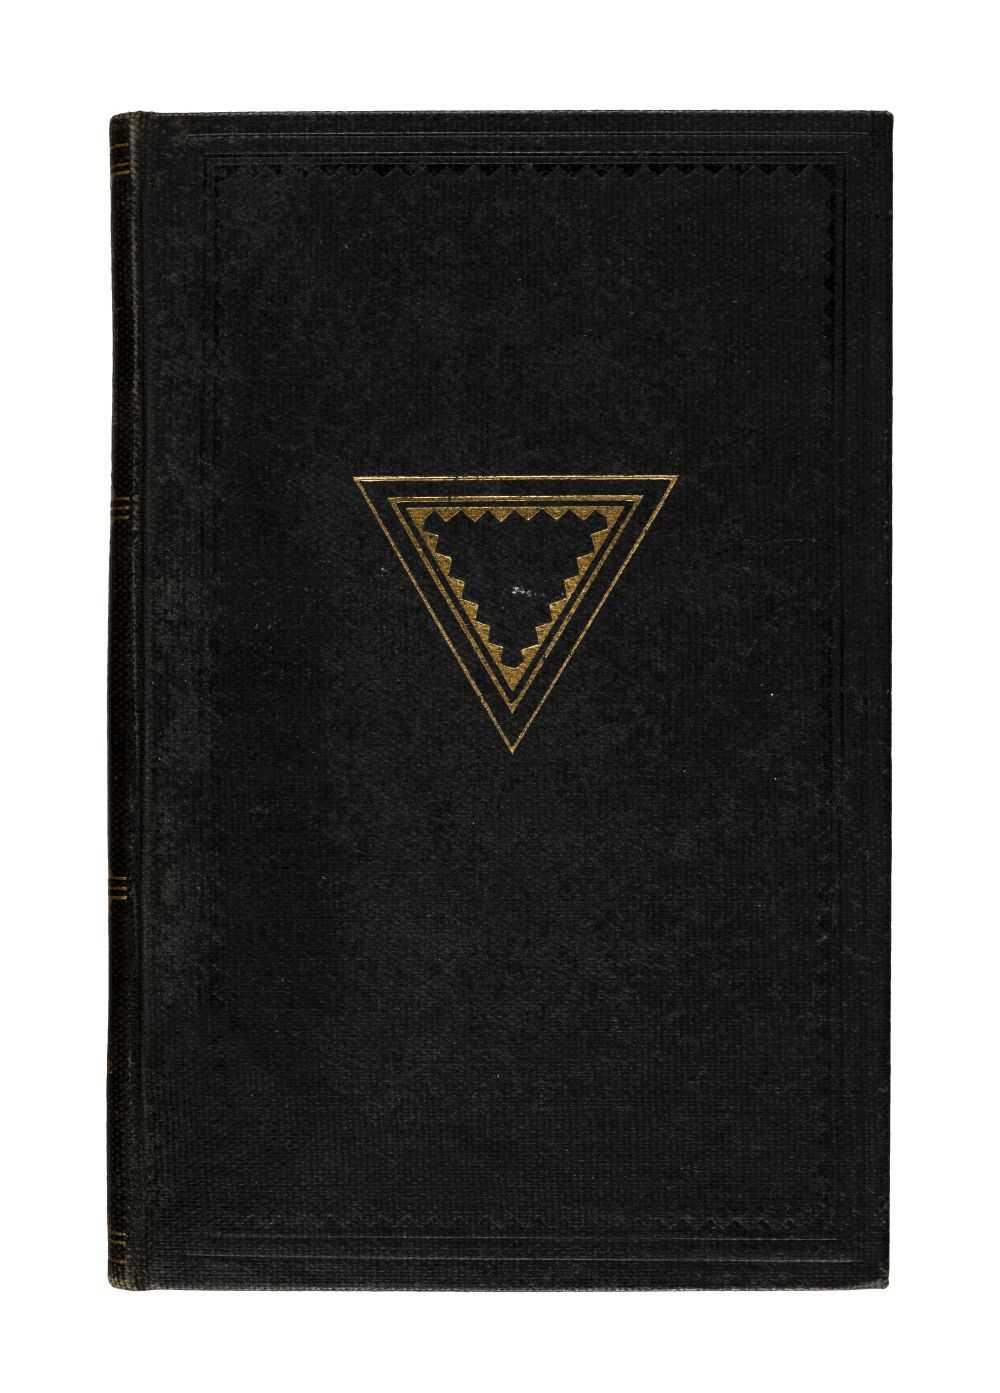 Lot 836-Joyce (James). Anna Livia Plurabelle, 1st edition, New York, 1928